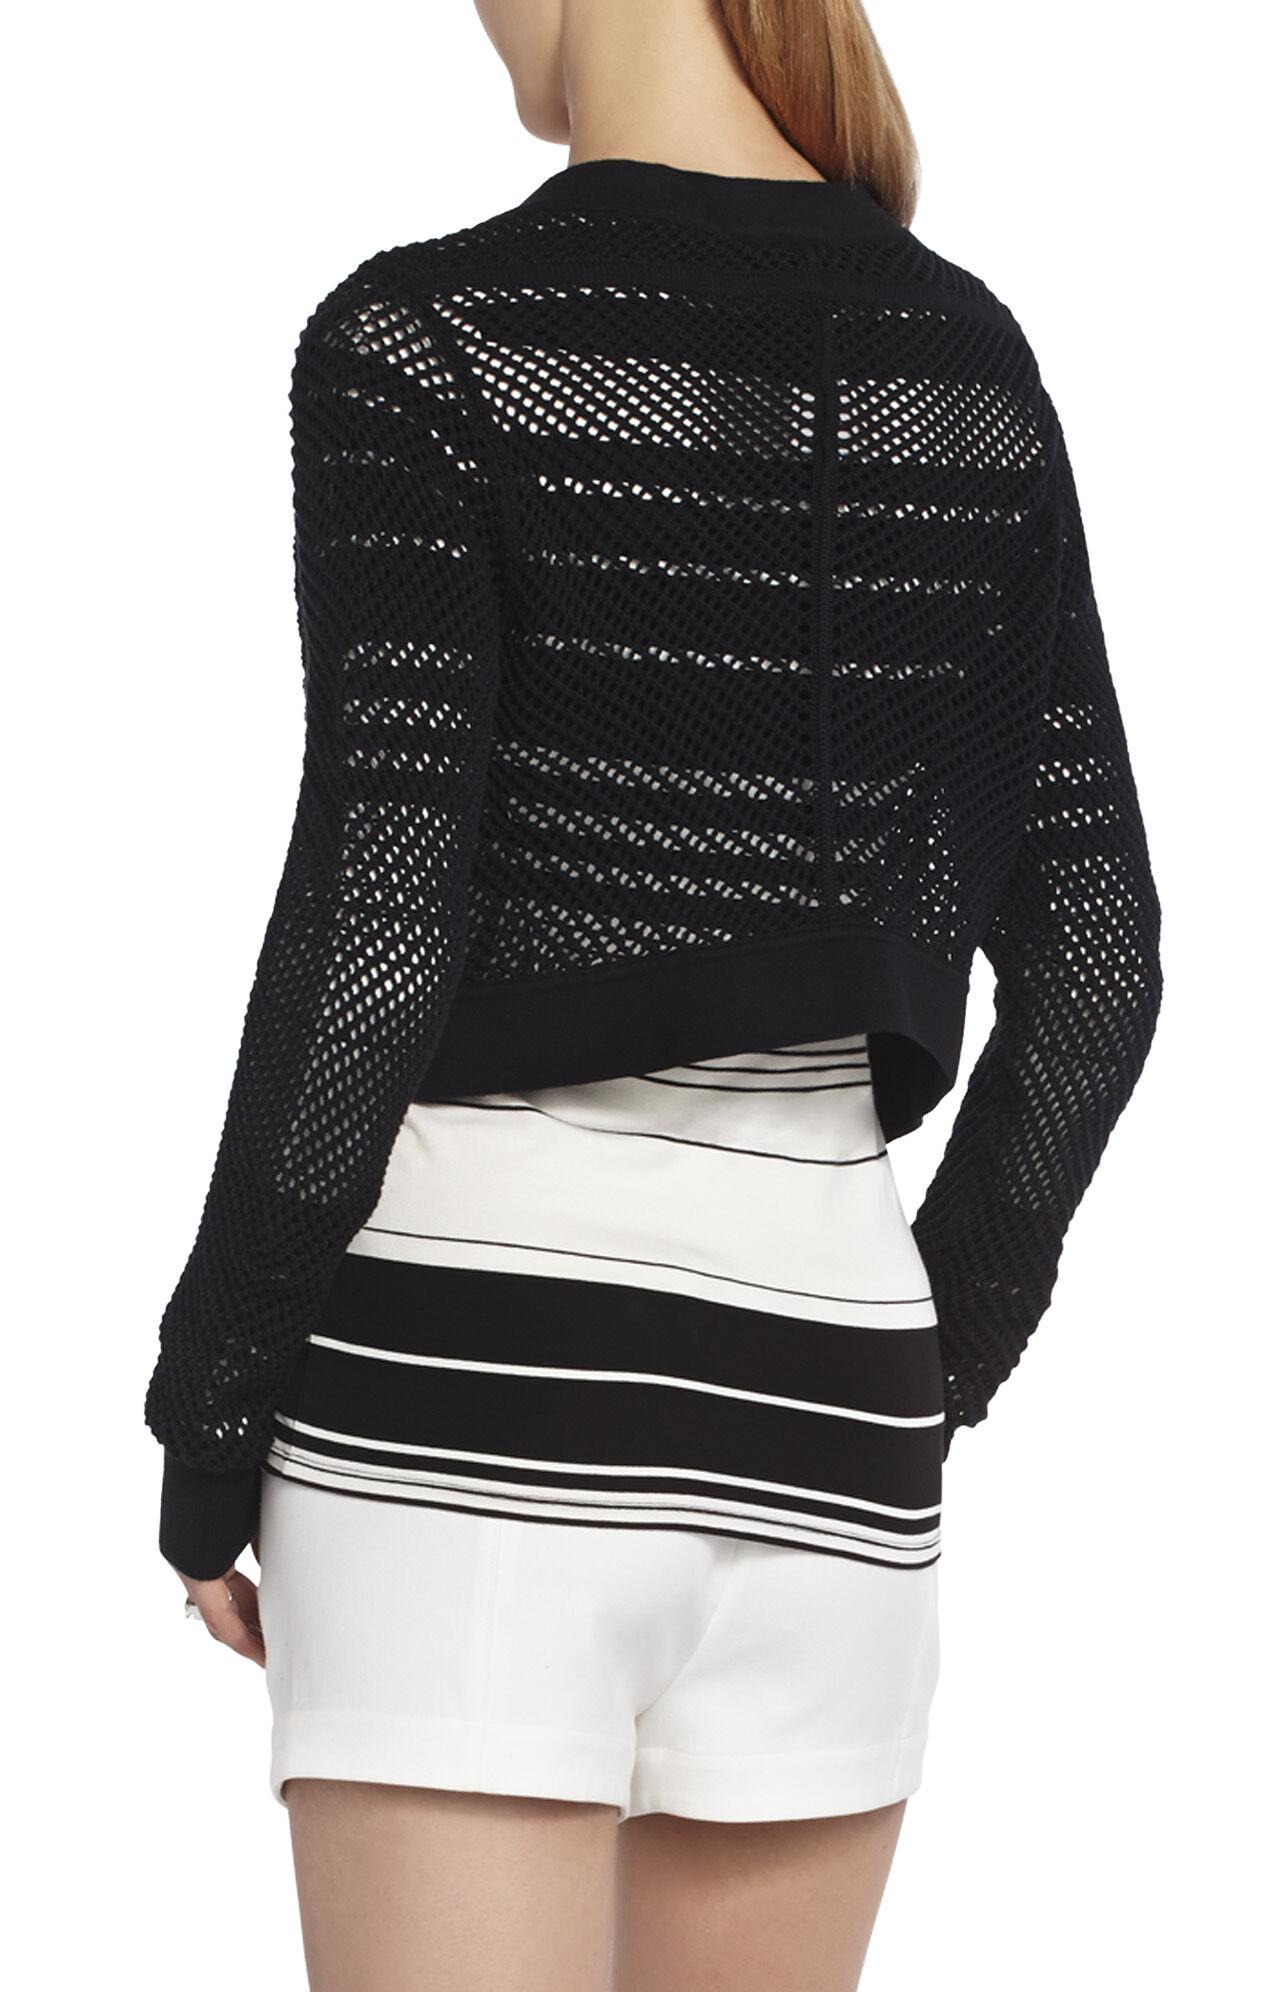 Acasia Pointelle Knit Sweater